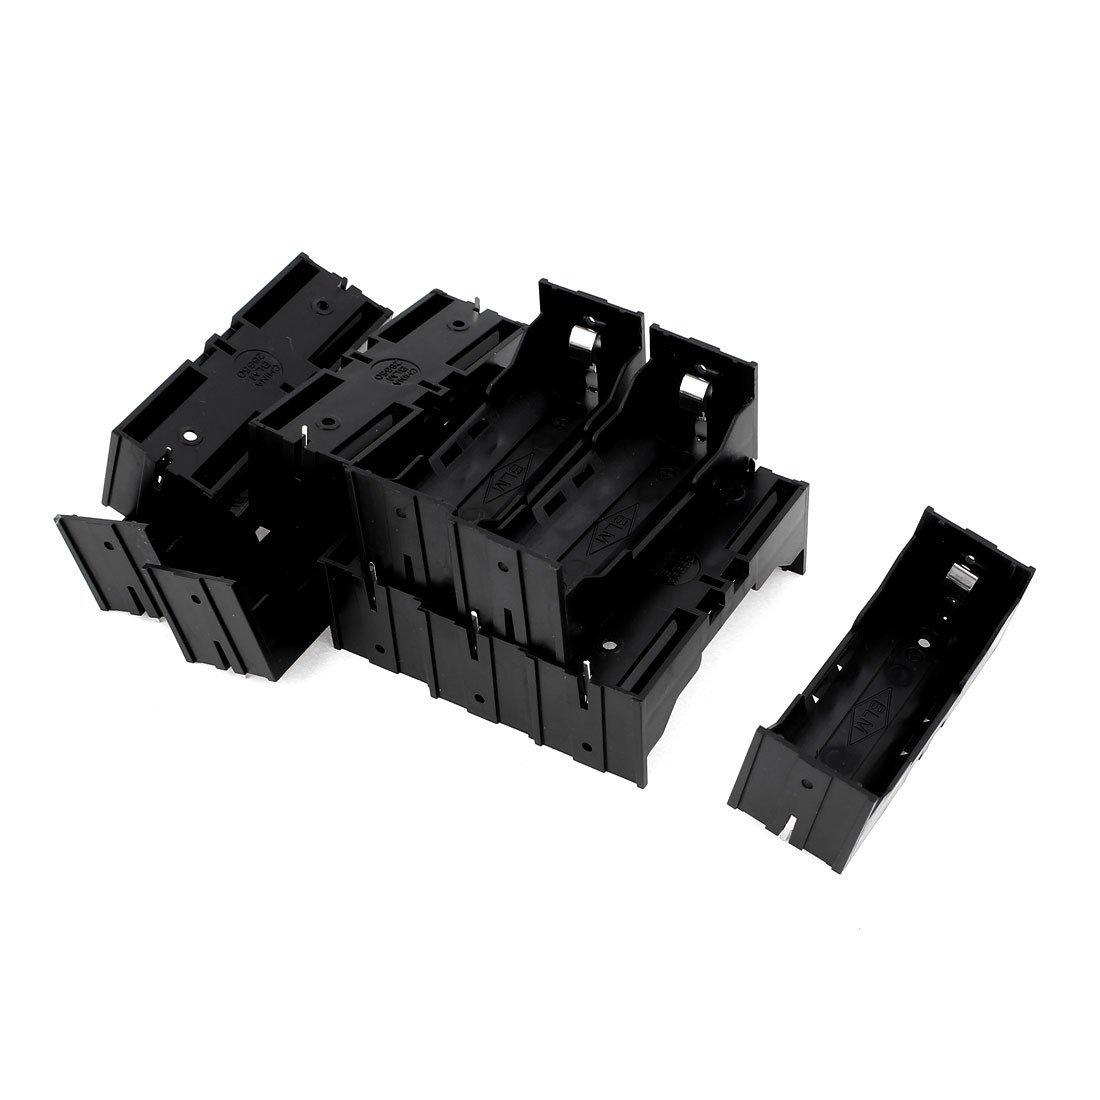 EDT-Plastic Single 26650 Battery Holder Case Storage Box 10Pcs Black